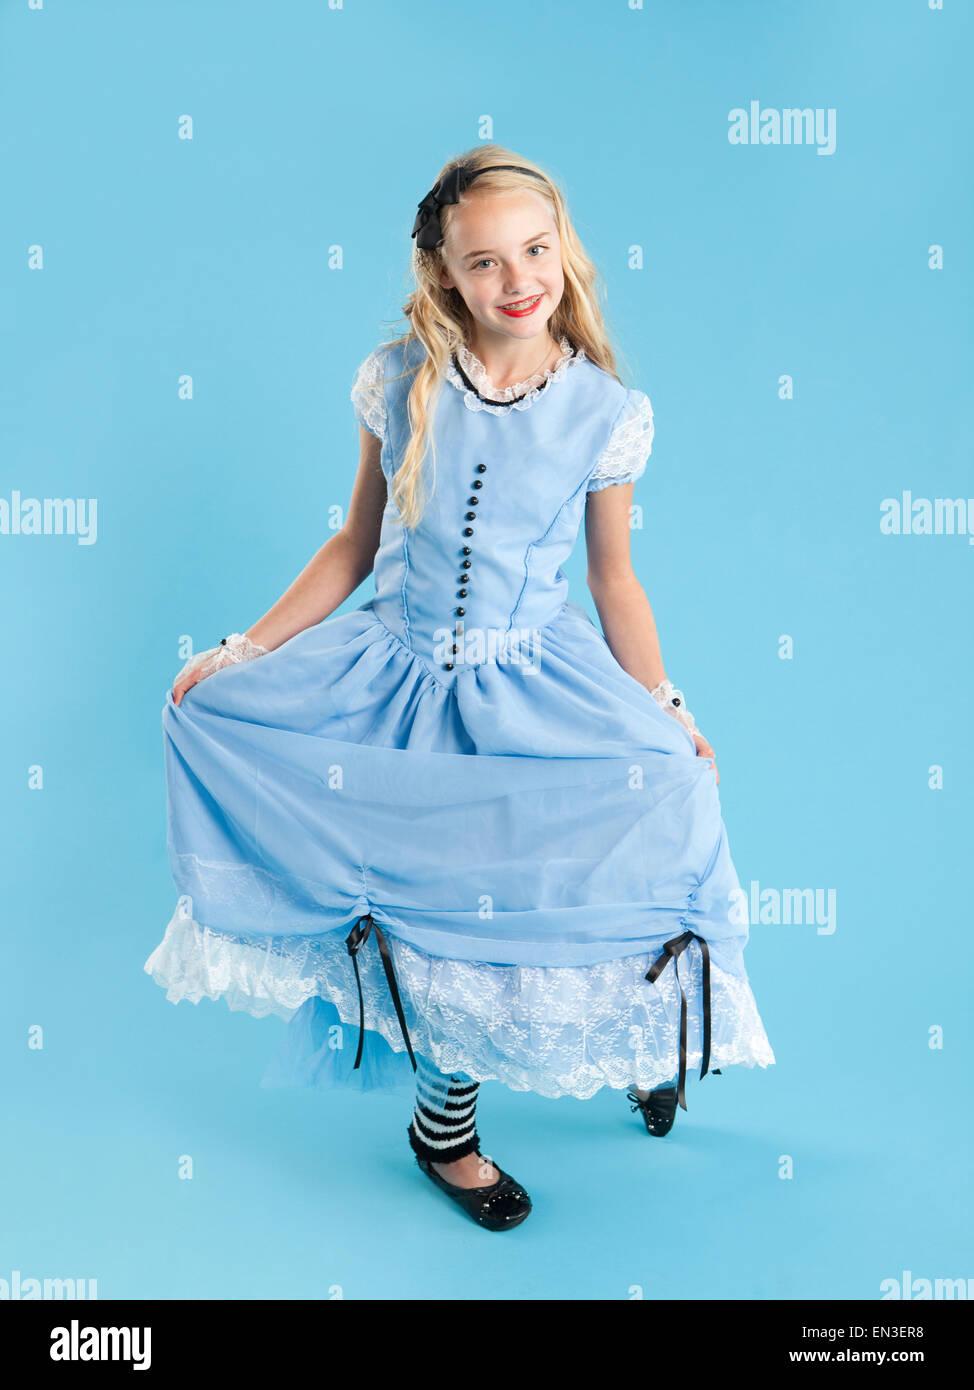 Portrait of girl (10-11) in Alice in Wonderland costume for Halloween - Stock Image